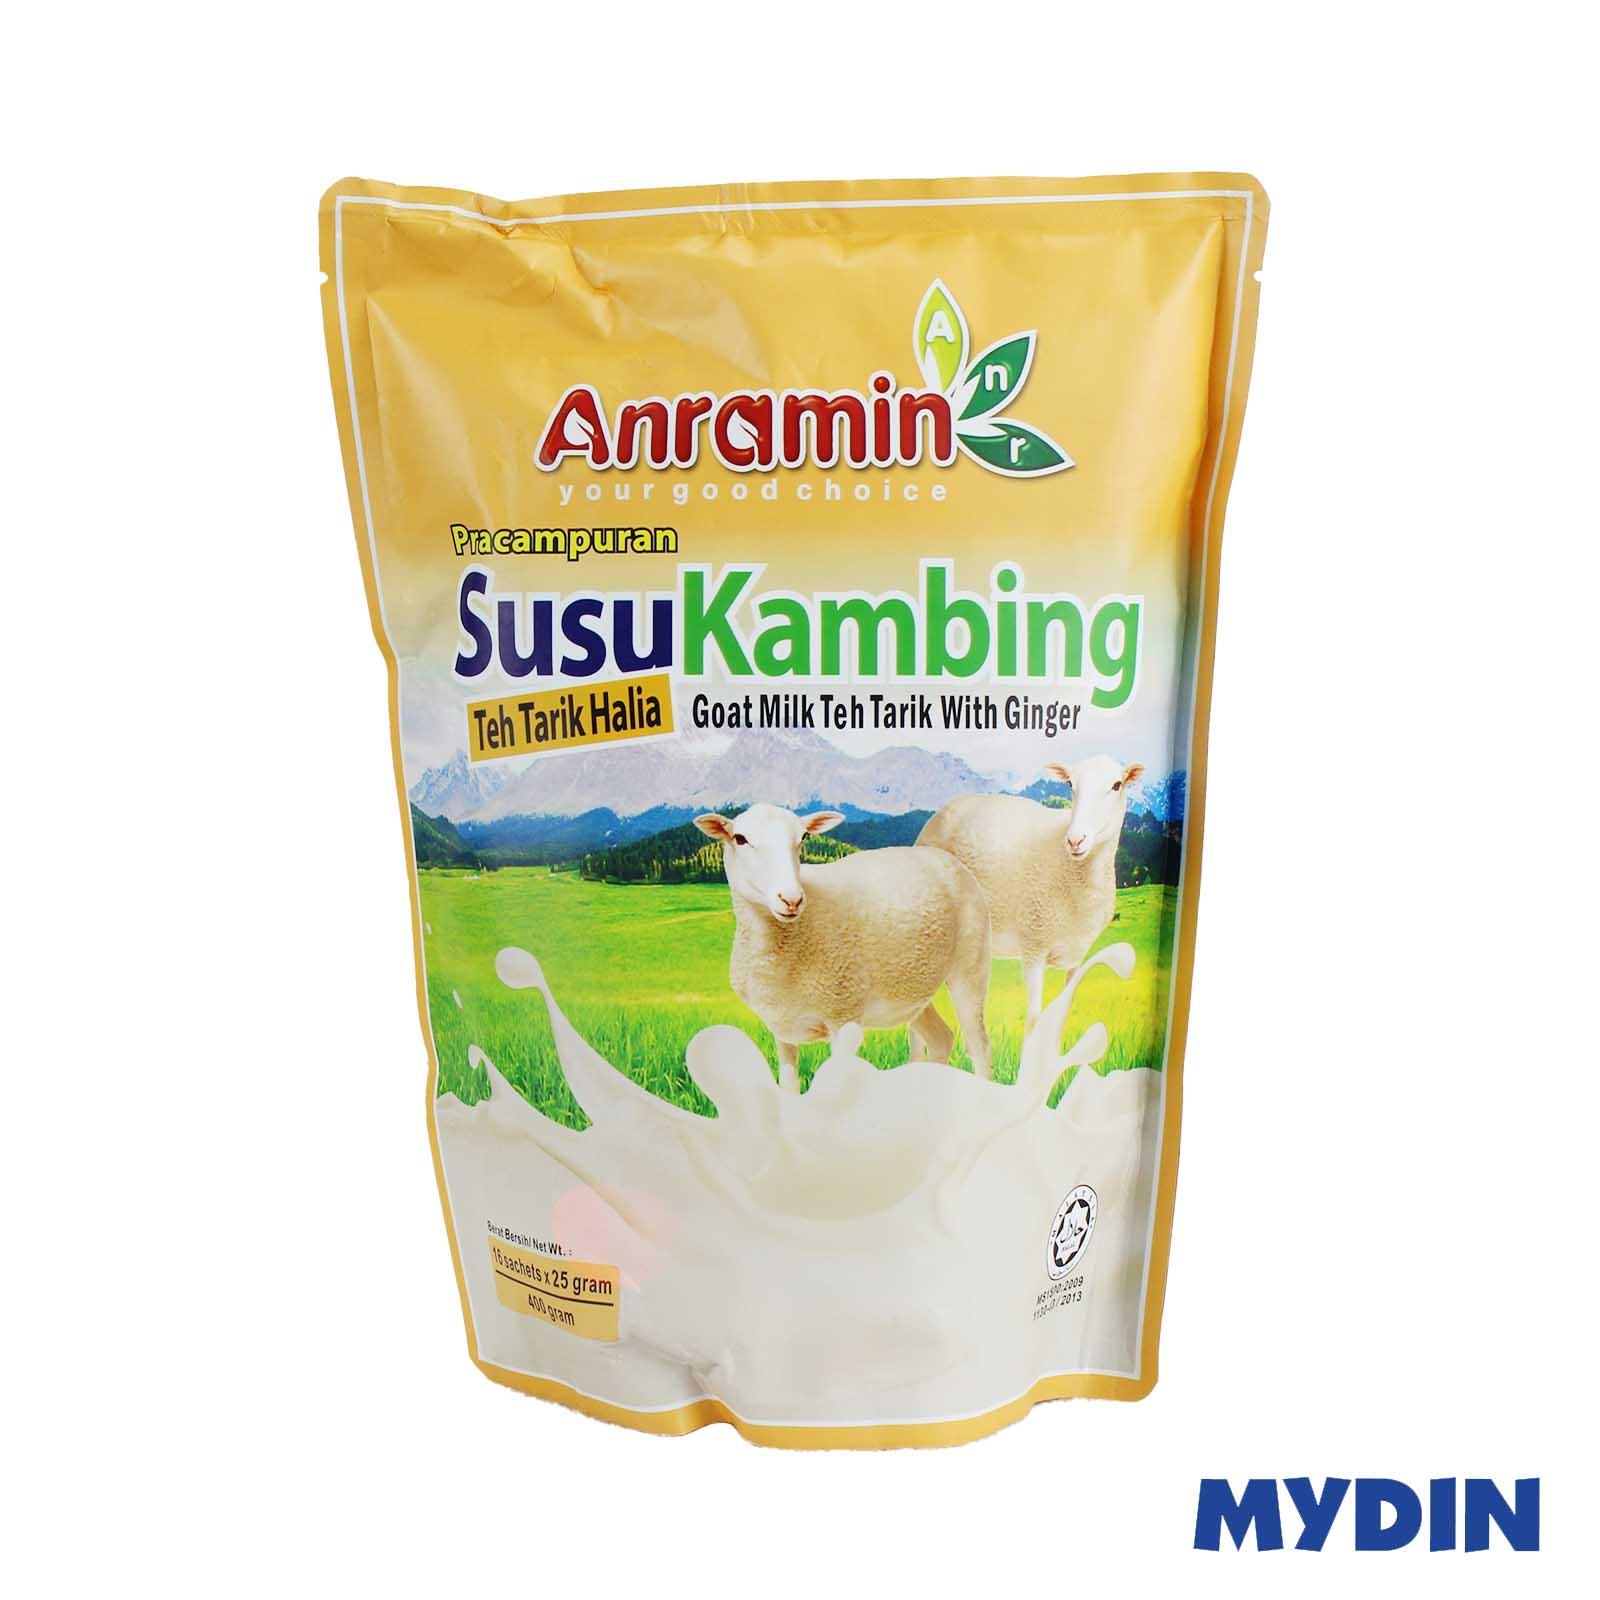 Anramin Goat Milk Teh Tarik With Ginger (25 x 16s)